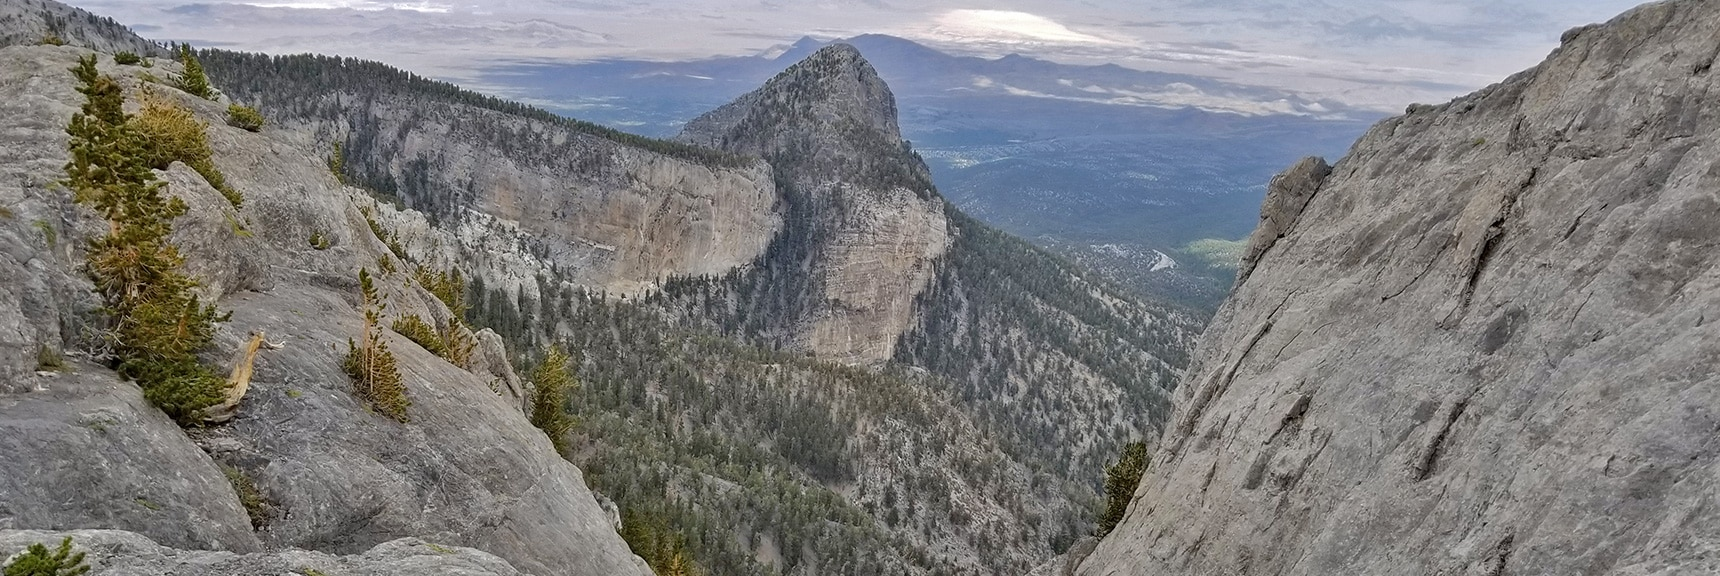 View Down Steep Canyon Toward Mummy's Head from Eastern Summit Cliffs   Mummy Mountain Northern Rim Overlook, Spring Mountain Wilderness, Nevada